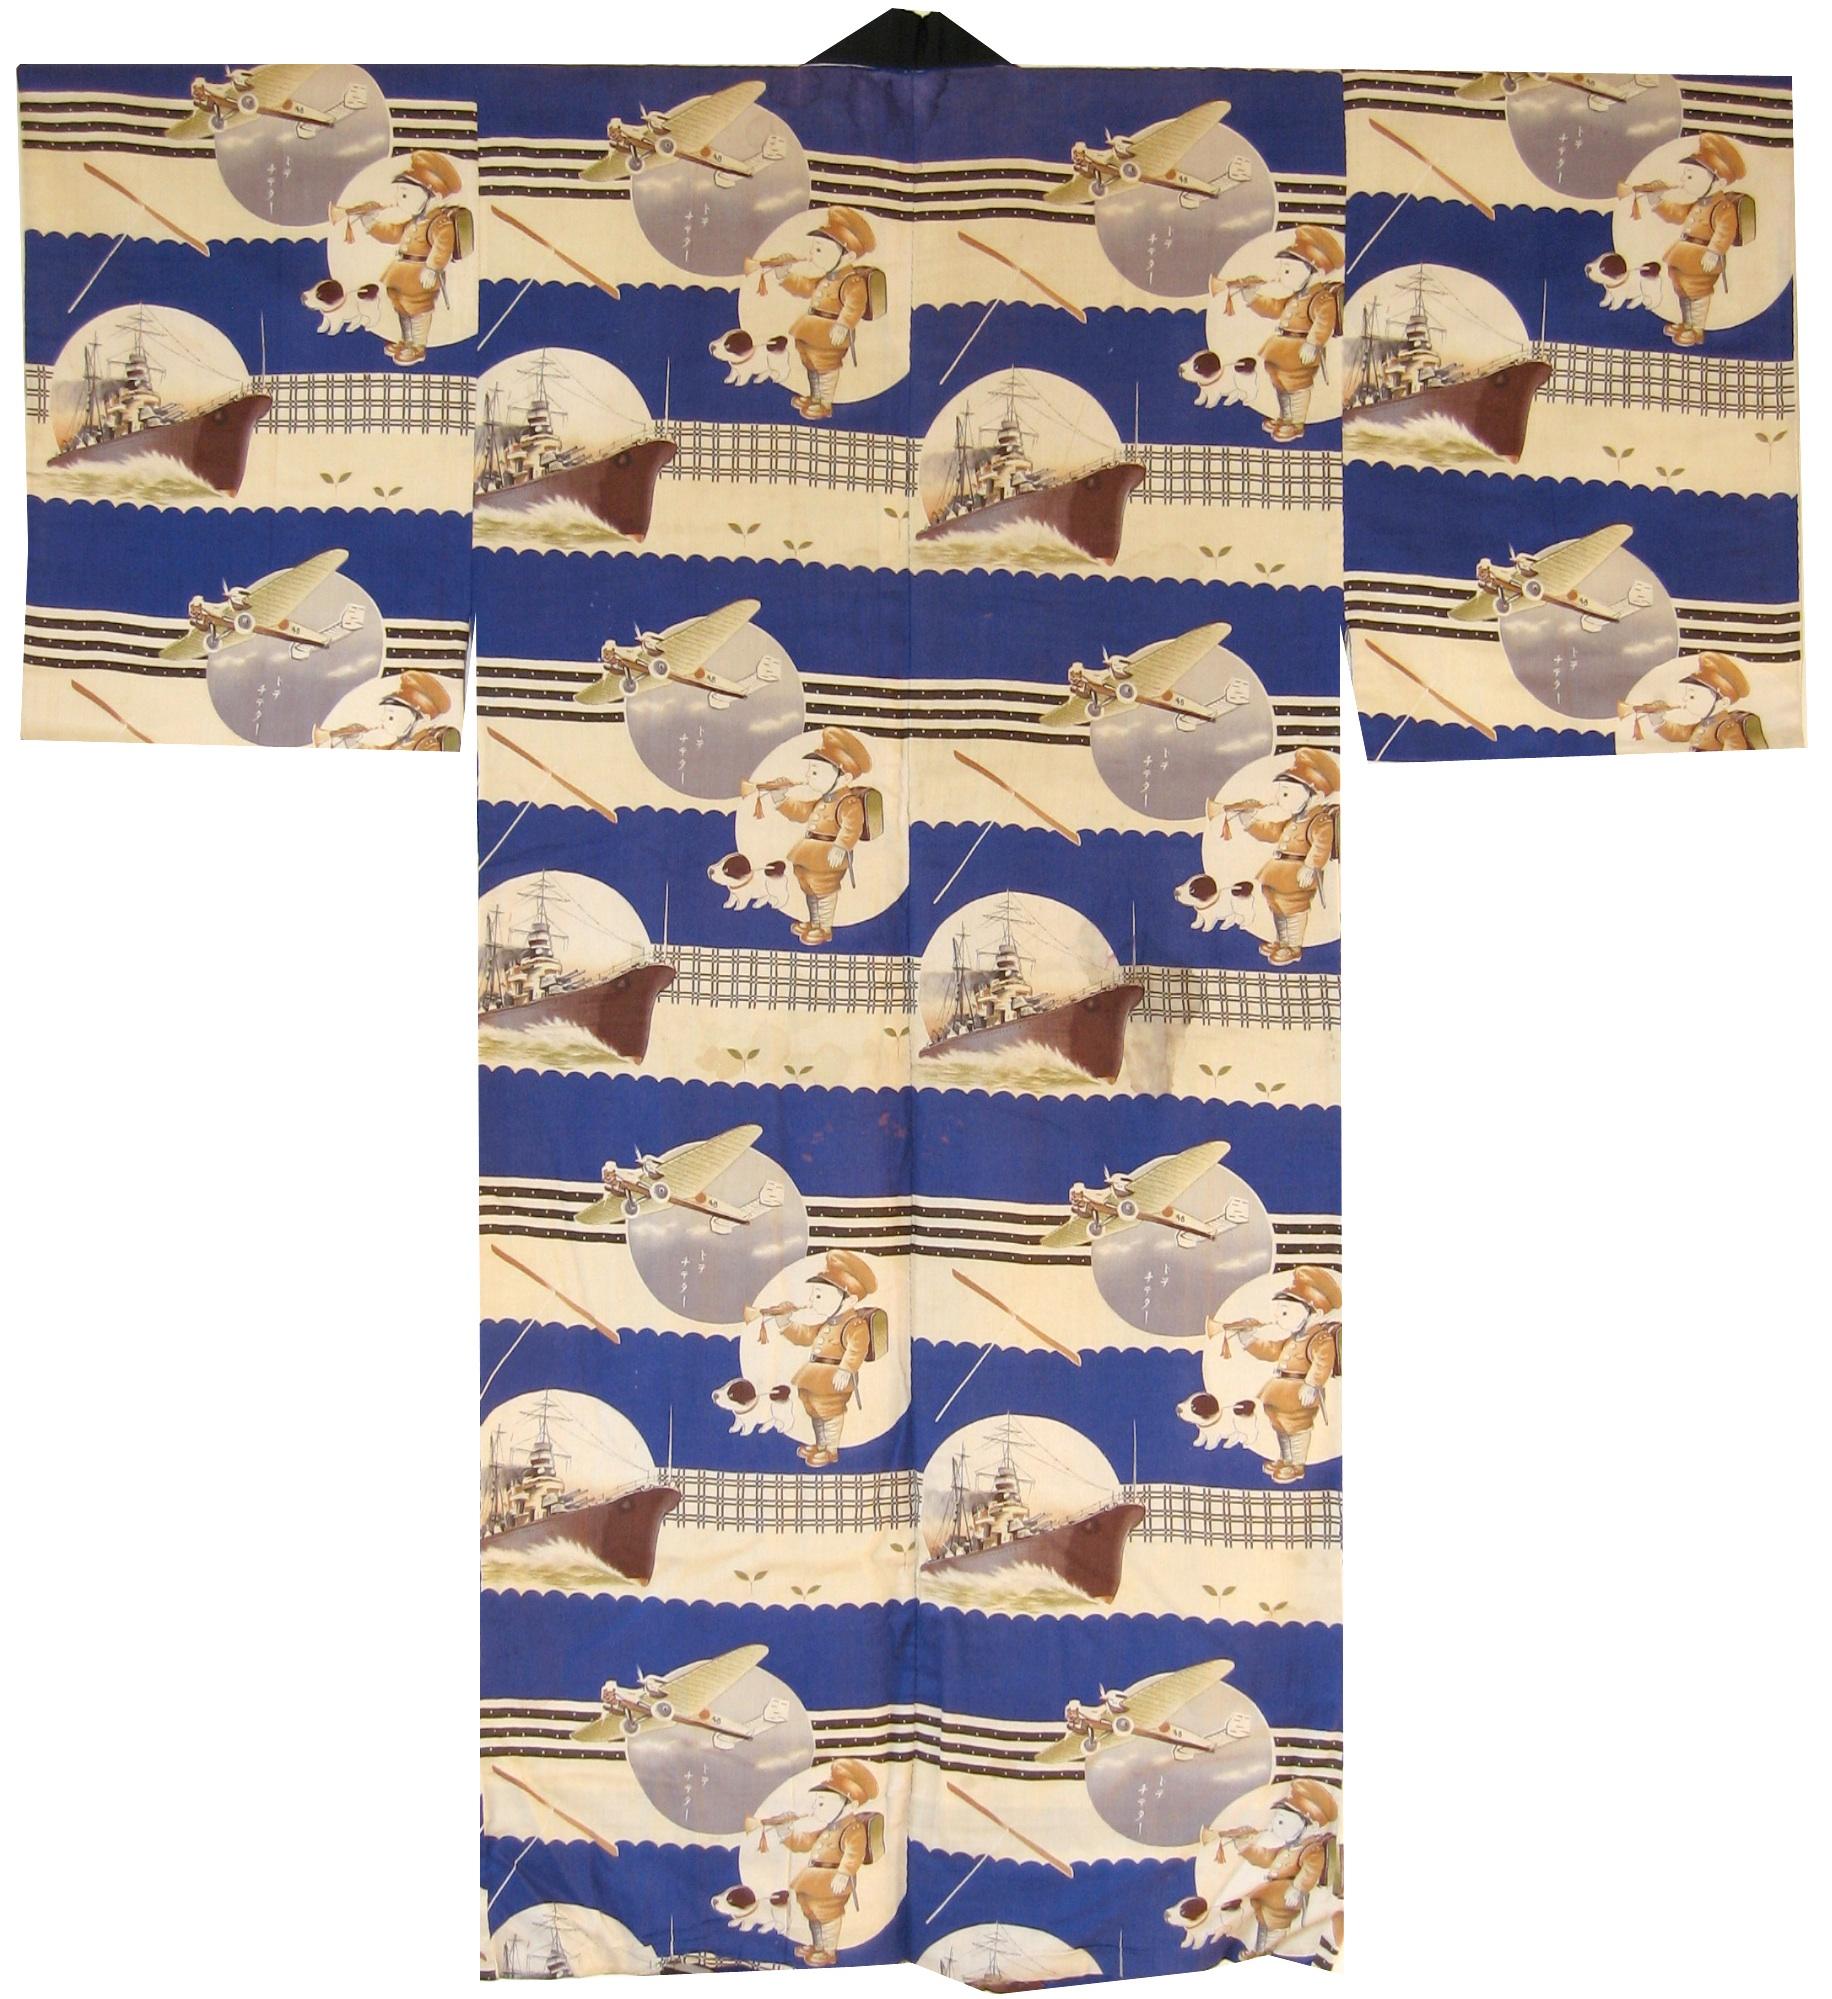 Bugle Boy, Men's Nagajuban, c. 1940, wool, 51/5h x 49w in.